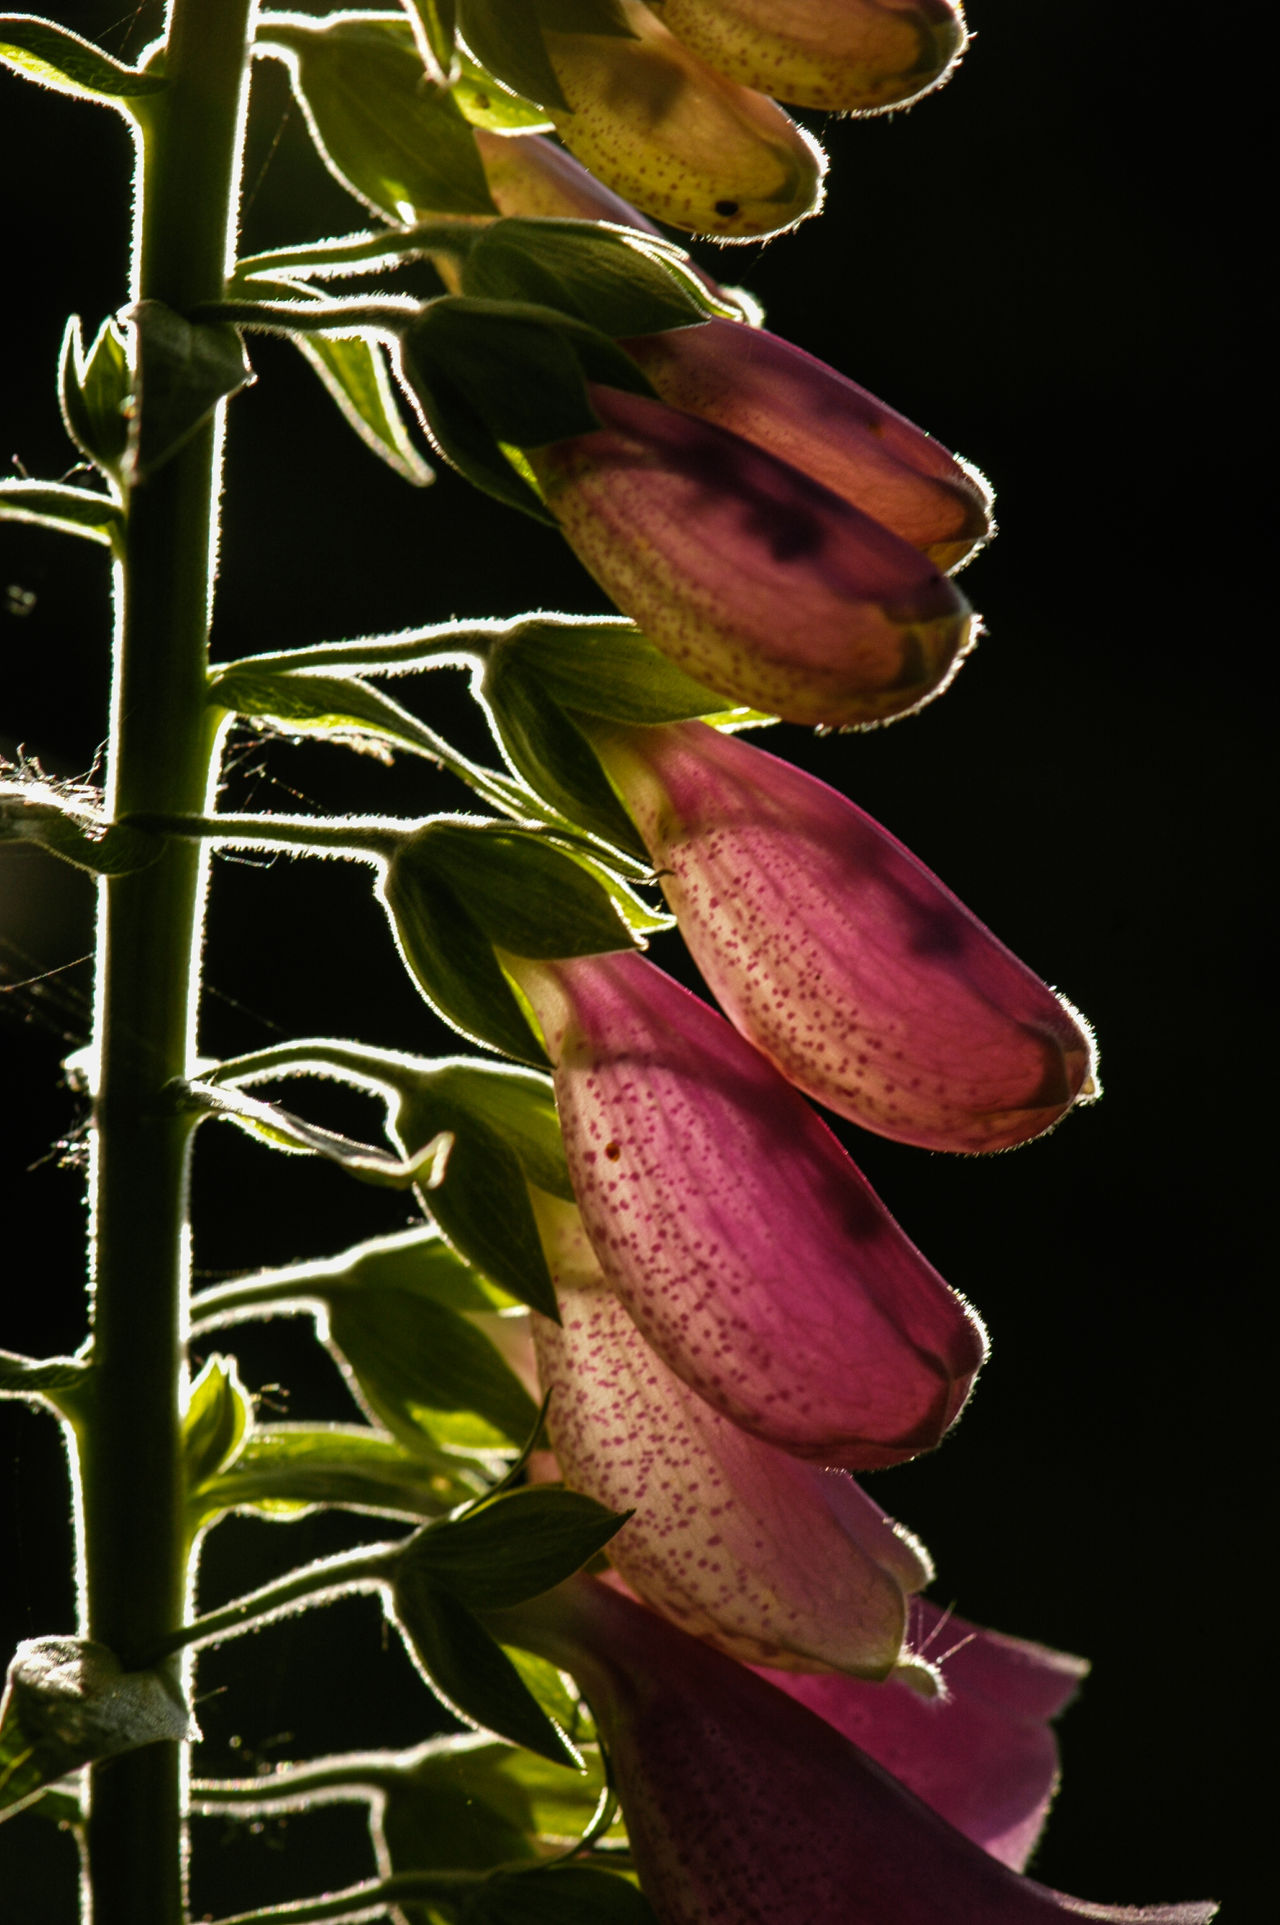 Backlit Foxglove flower Back Lit Beauty In Nature Black Background Close-up Day Digitalis Flower Flower Head Foxglove Fragility Freshness Garden Garden Flowers Garden Photography Growth Nature No People Outdoors Petal Pink Flower Plant Stem